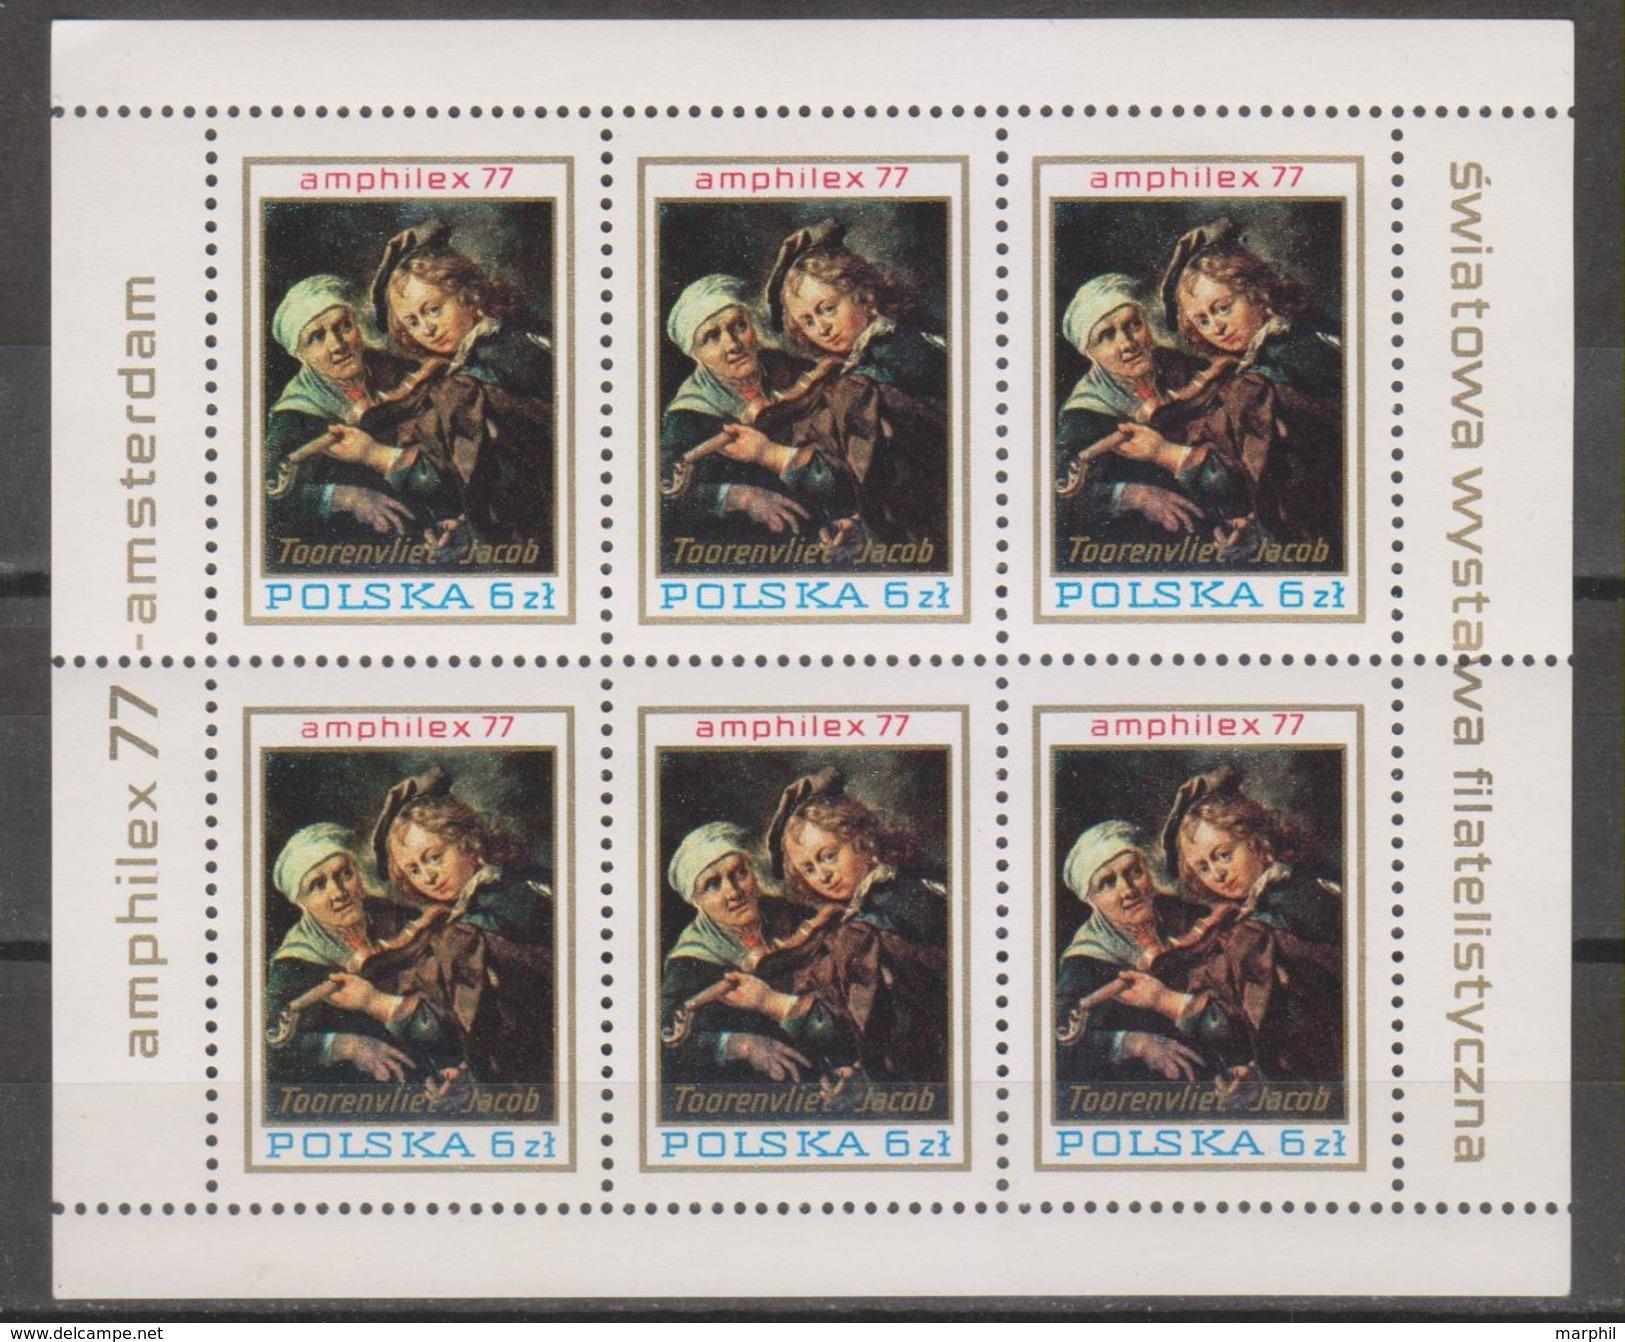 POLONIA 1977 MiN°2506 Blk MNH - Blocks & Sheetlets & Panes